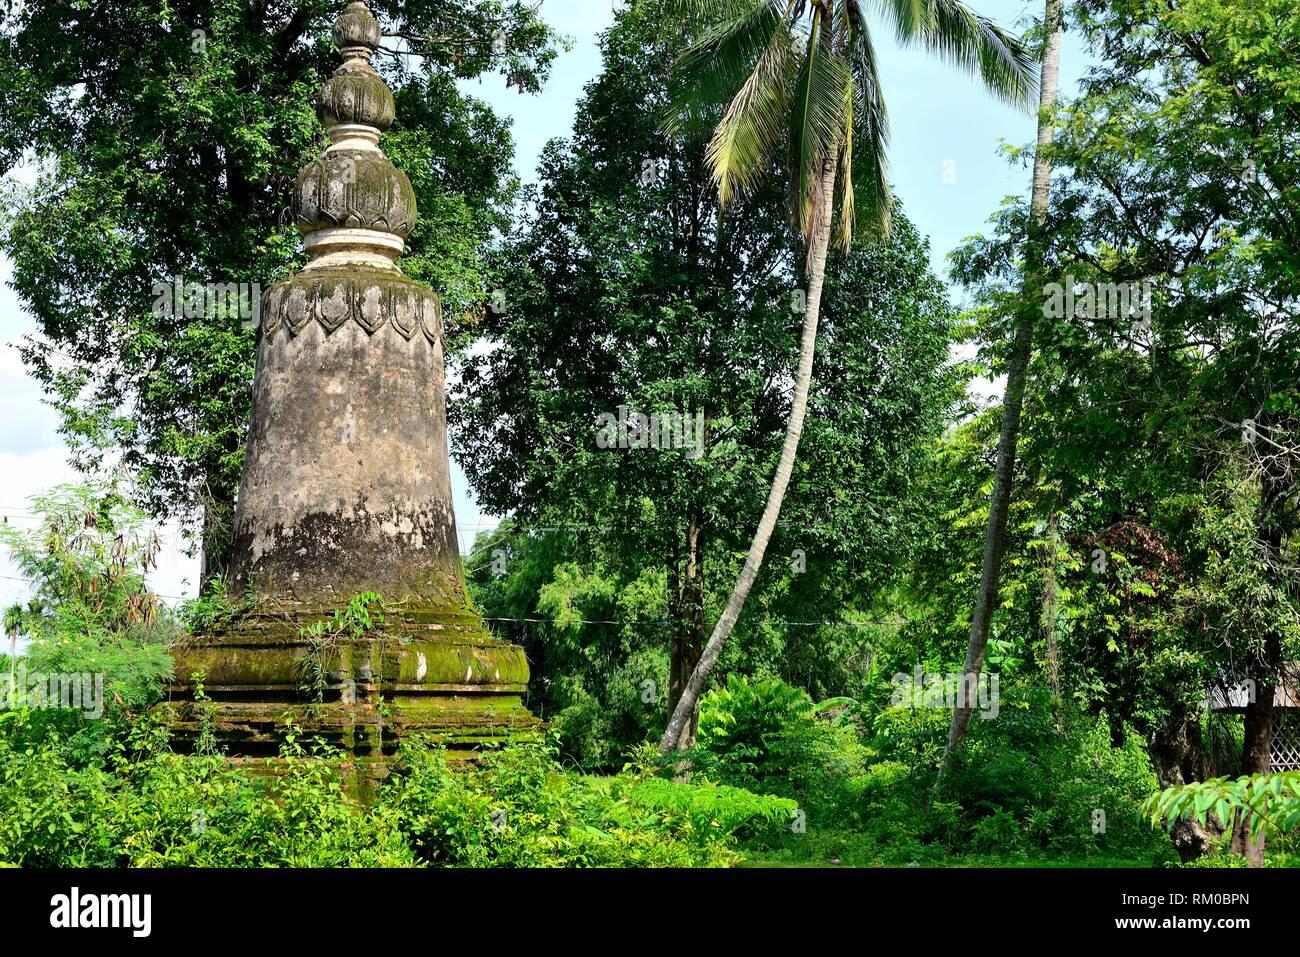 Stupa in Wat Ty Pram Trong in Koh Trong island, Kratie province, Cambodia - Stock Image